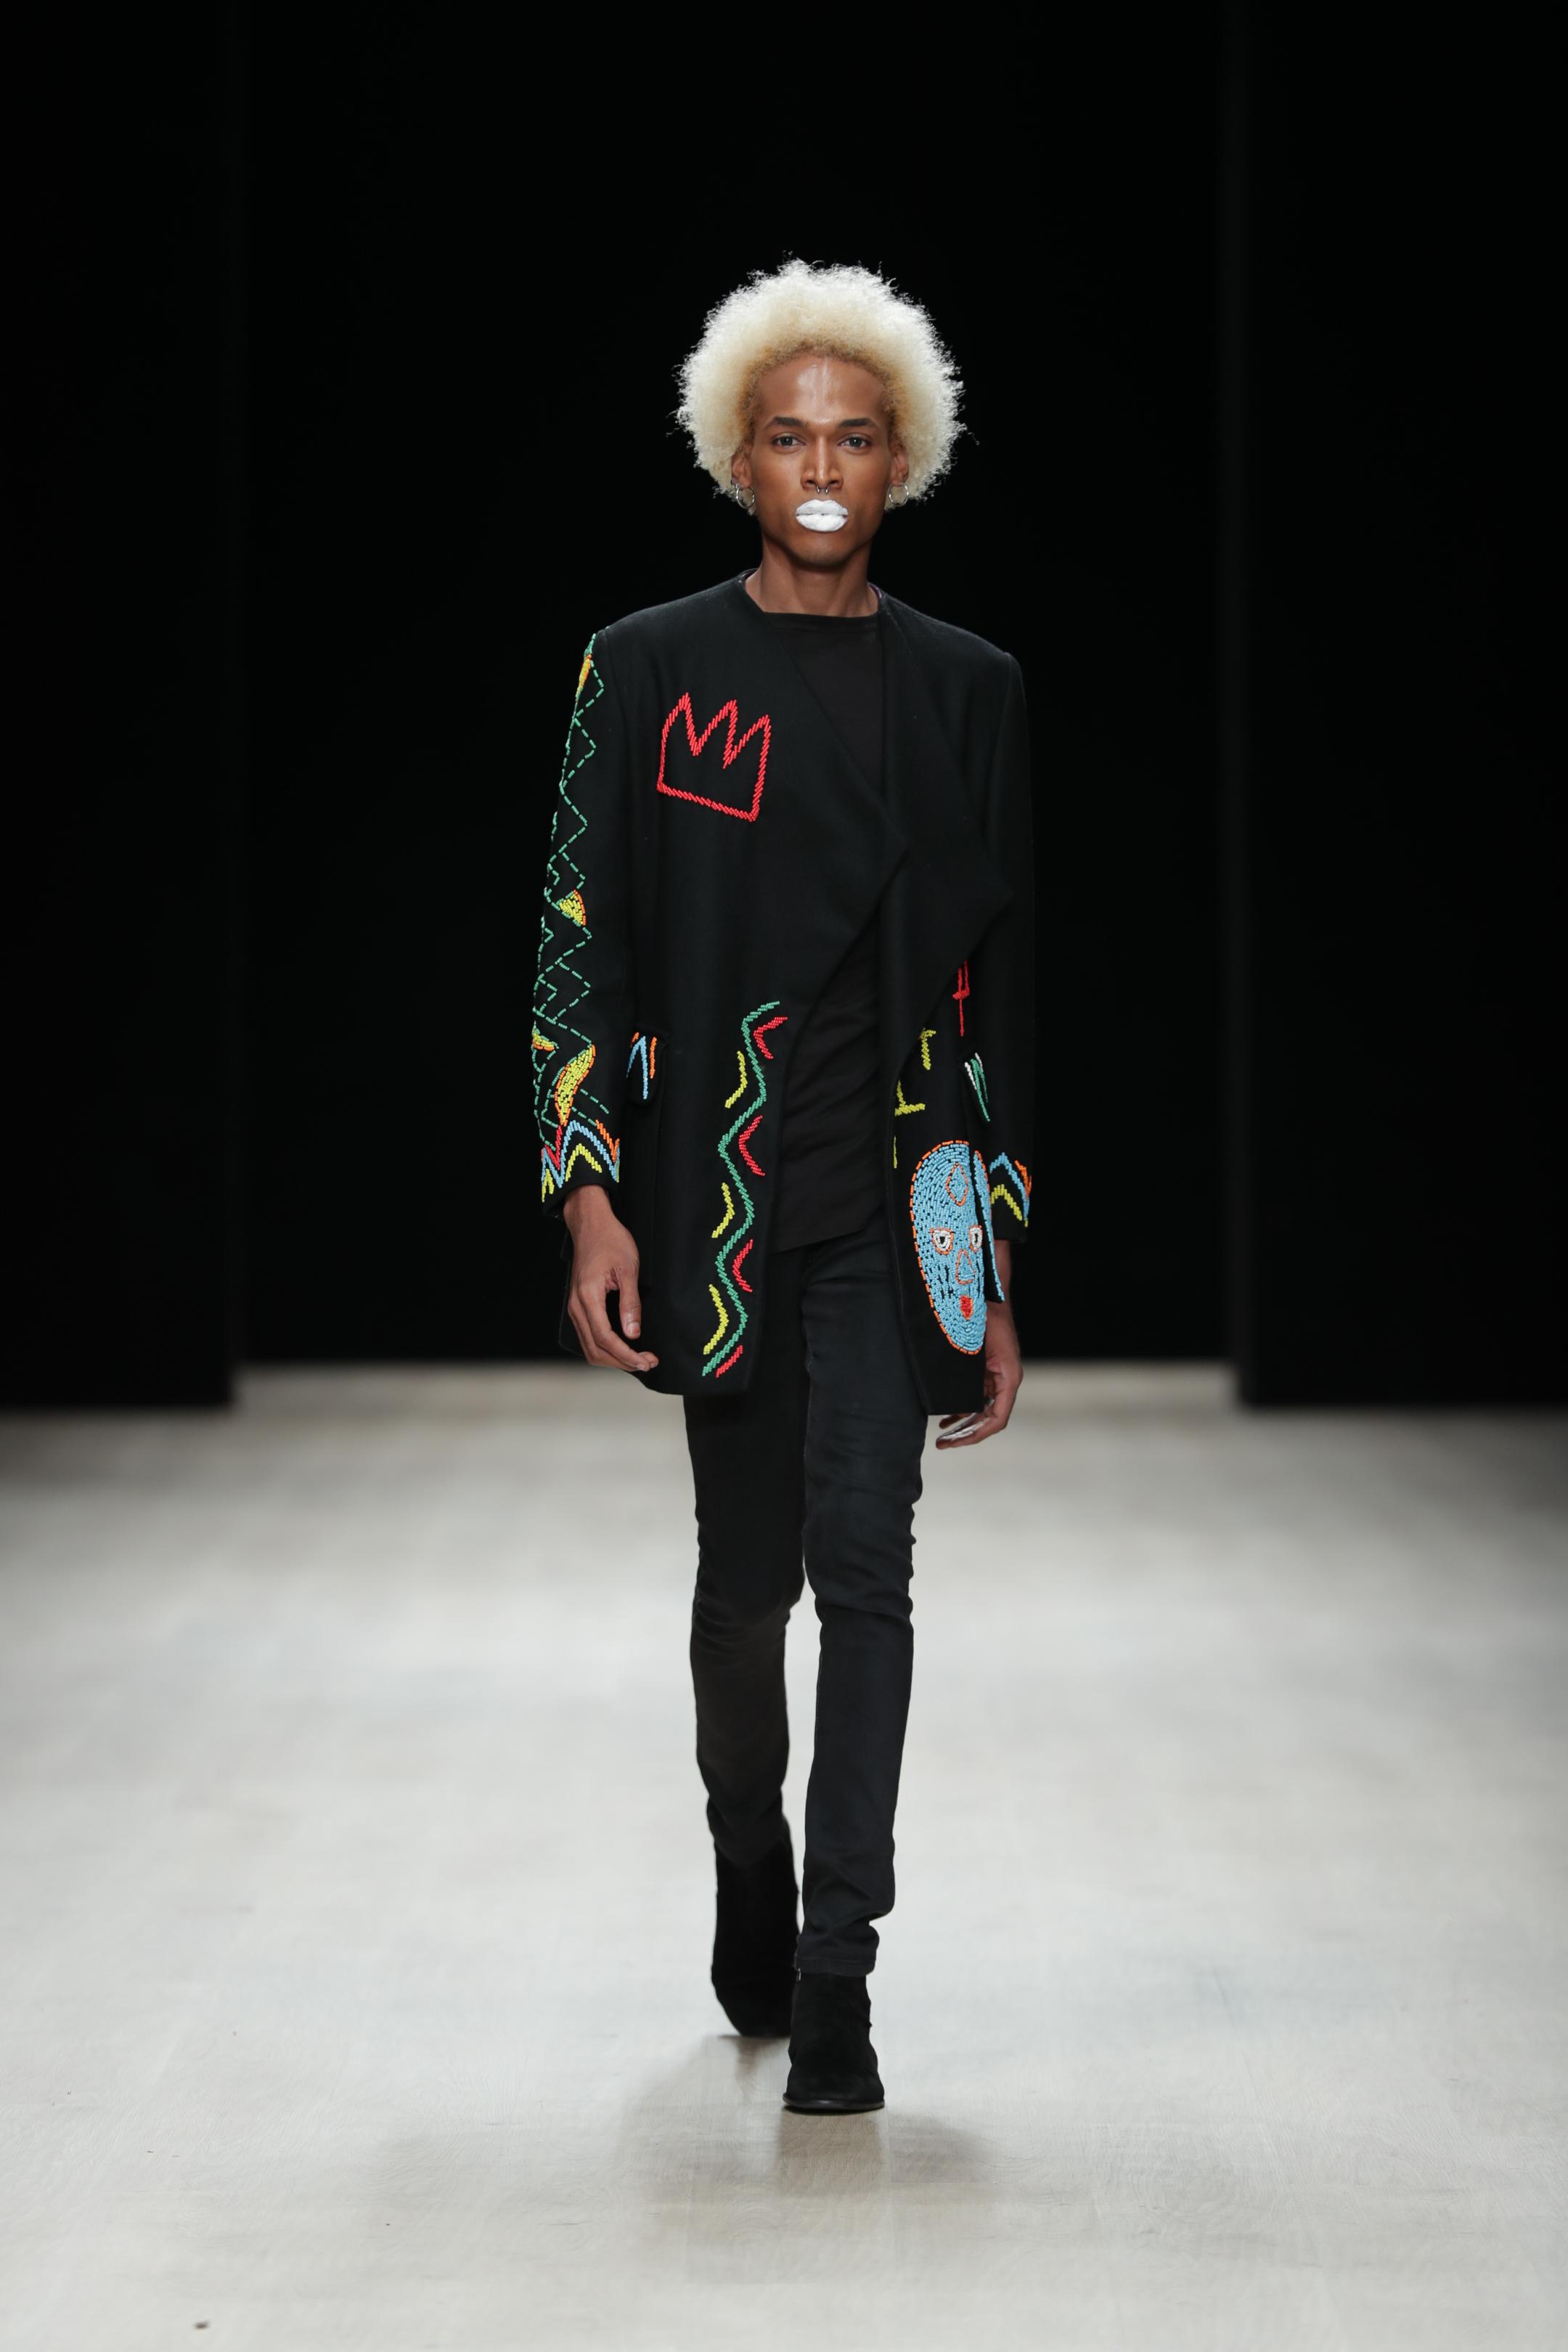 ARISE Fashion Week 2019 – Runway Day 3: Okunoren